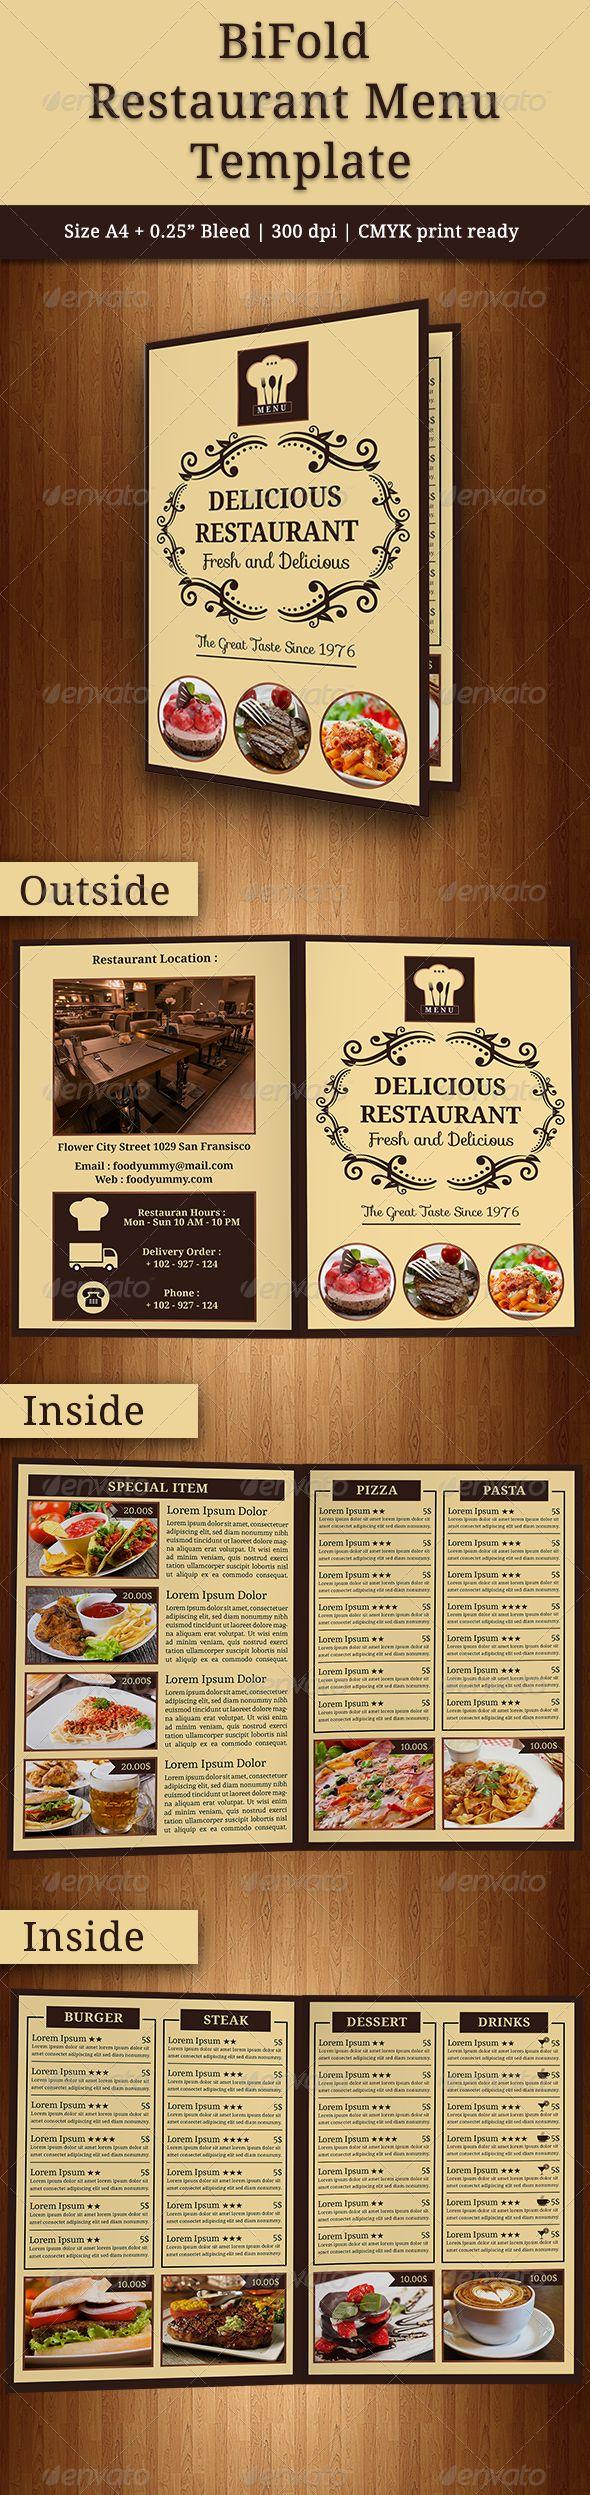 BiFold Restaurant Menu 22 best Design Templates